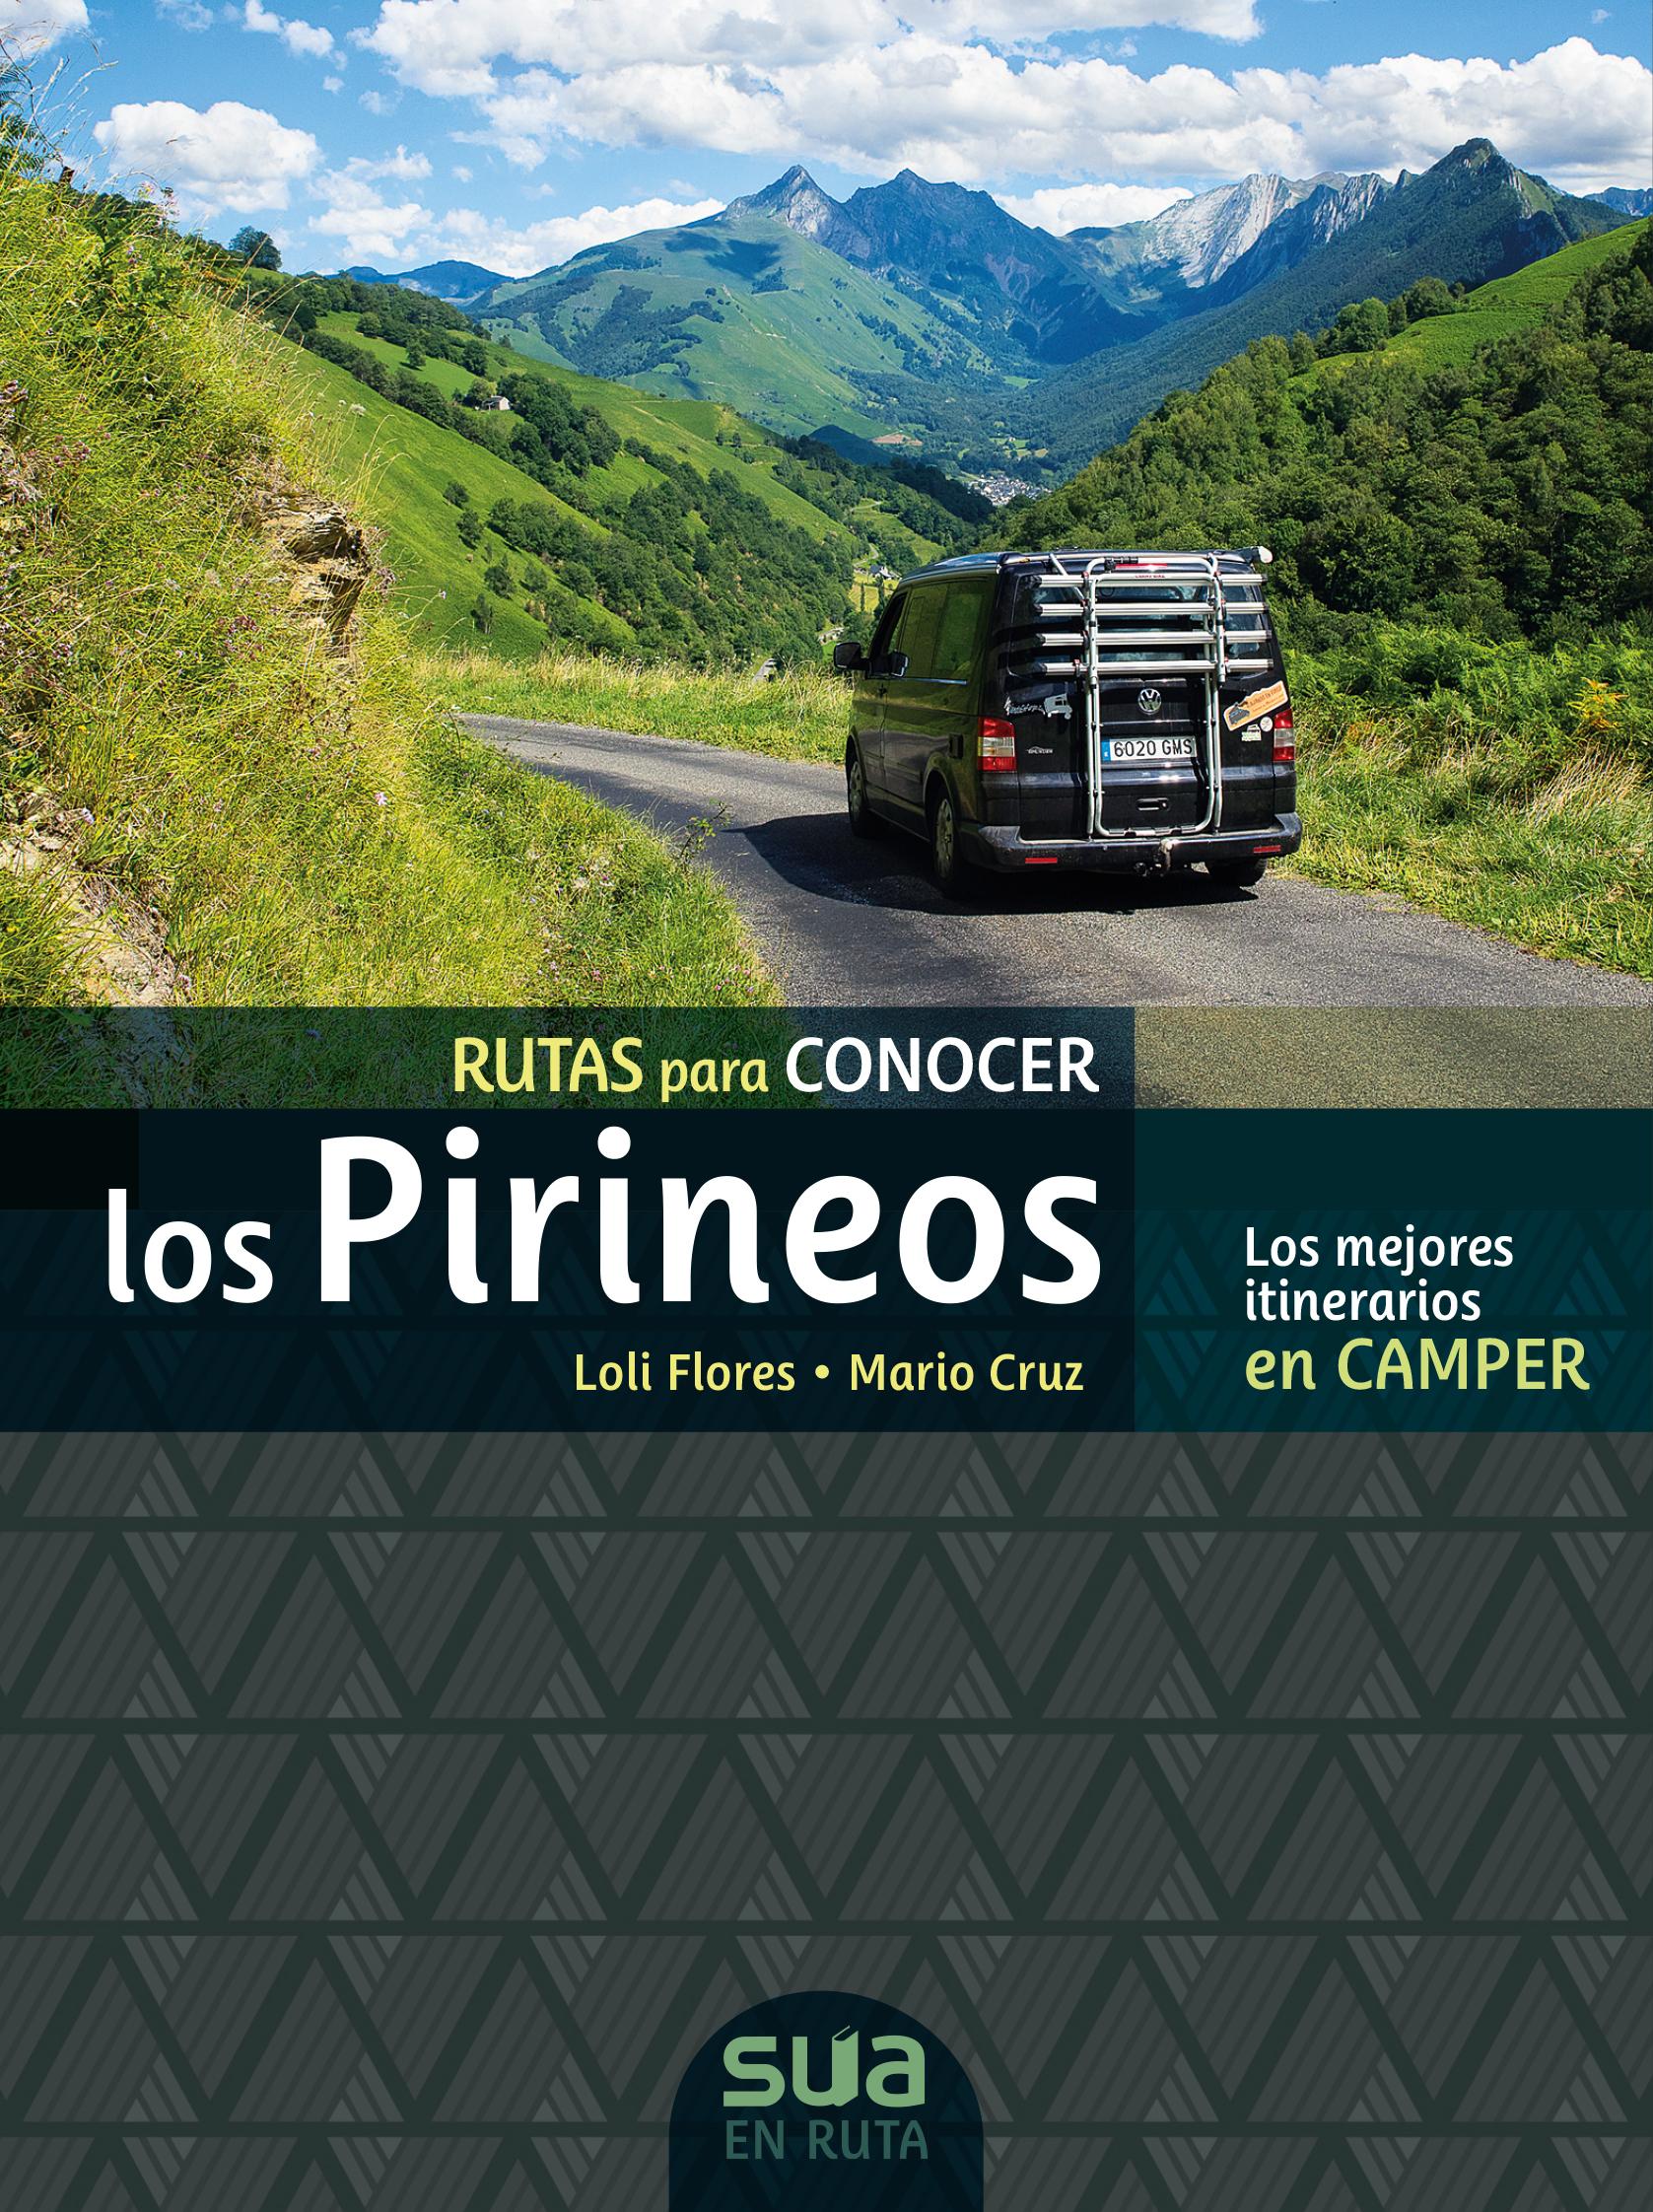 CAMPER_PIRI_enruta_CUBIERTA_DEF.indd